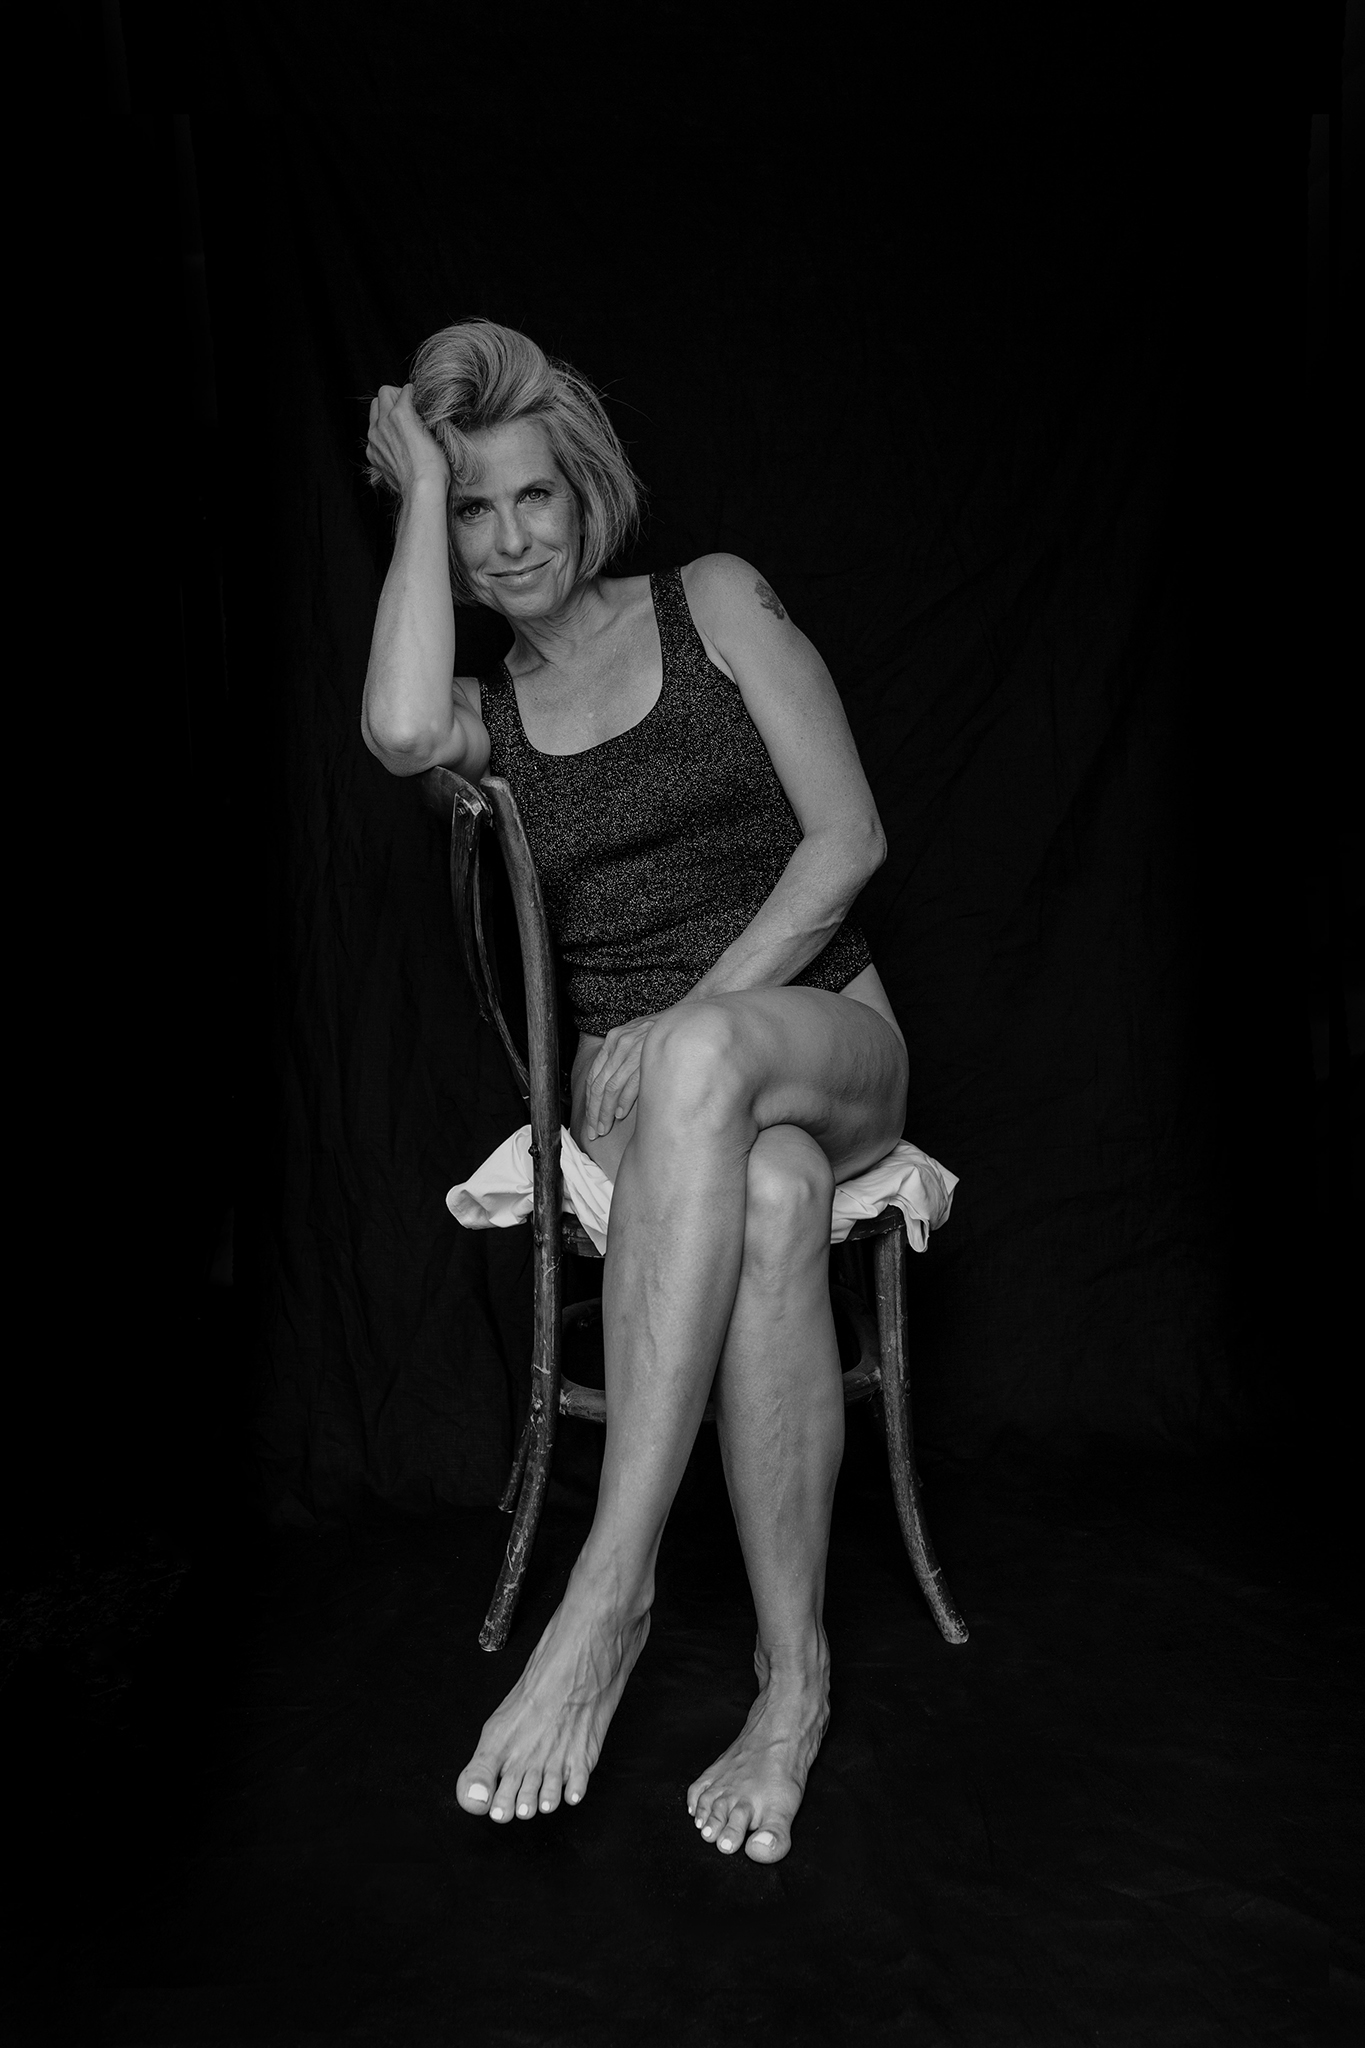 Strahlende Frau im Sitzen fotografiert